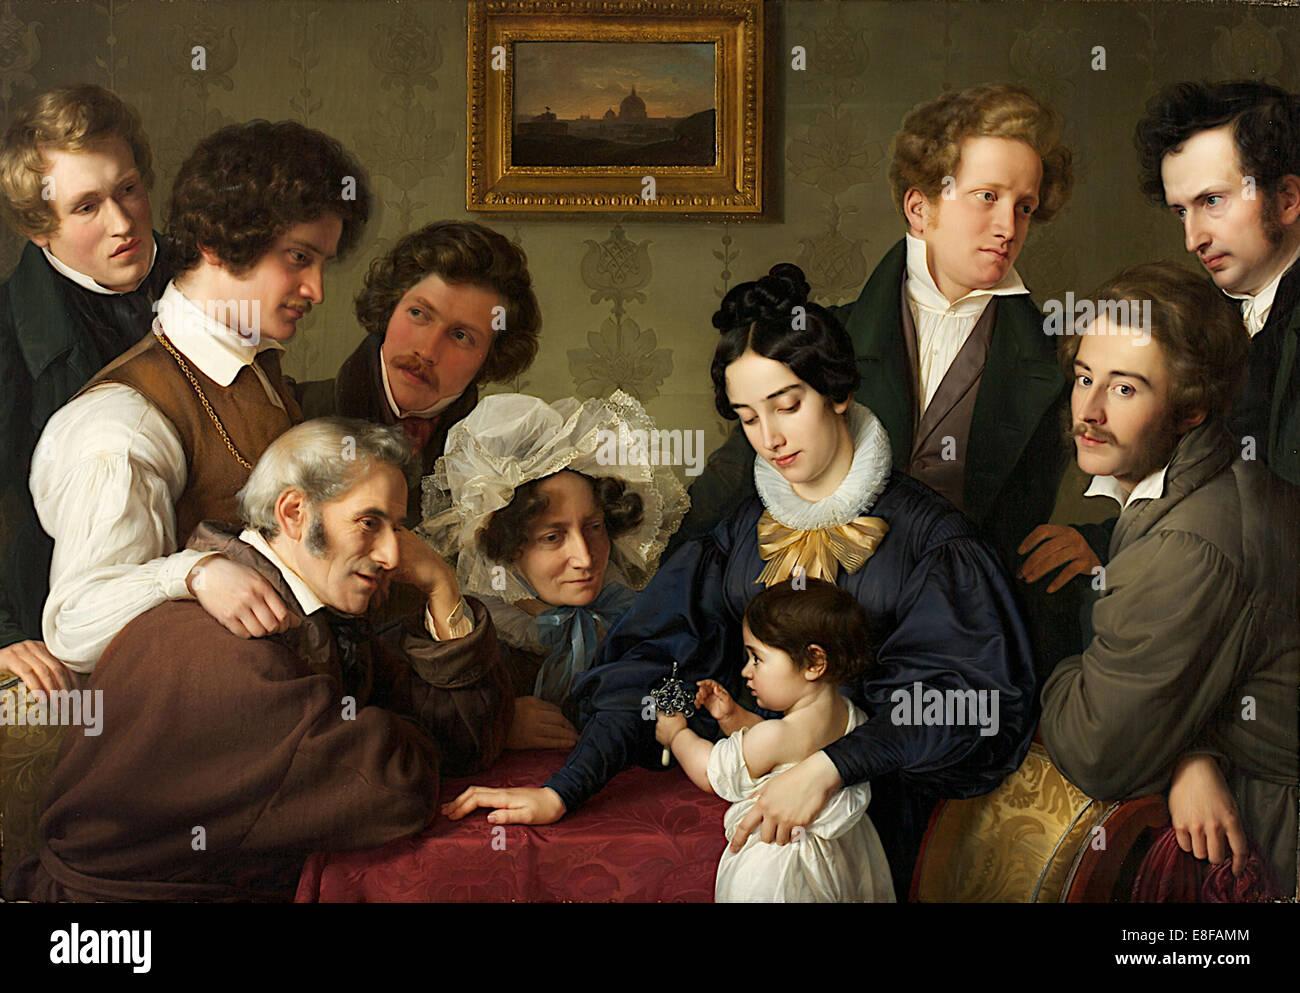 The Schadow Circle. (The Bendemann Family and their Friends). Artist: Bendemann, Eduard (1811-1889) - Stock Image